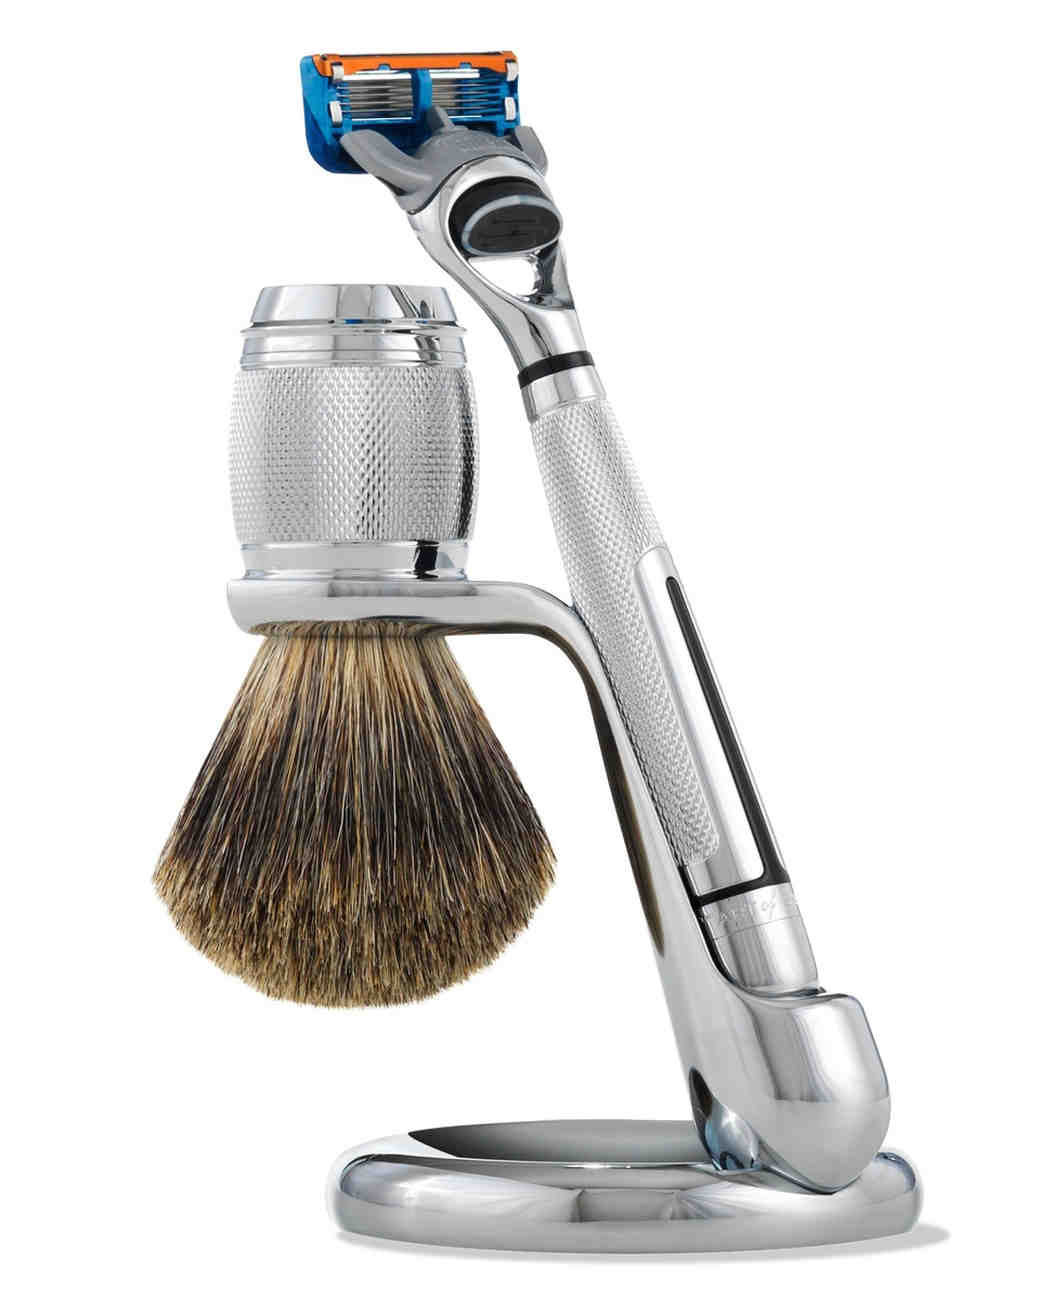 mens-grooming-products-art-of-shaving-brush-and-razor-1114.jpg